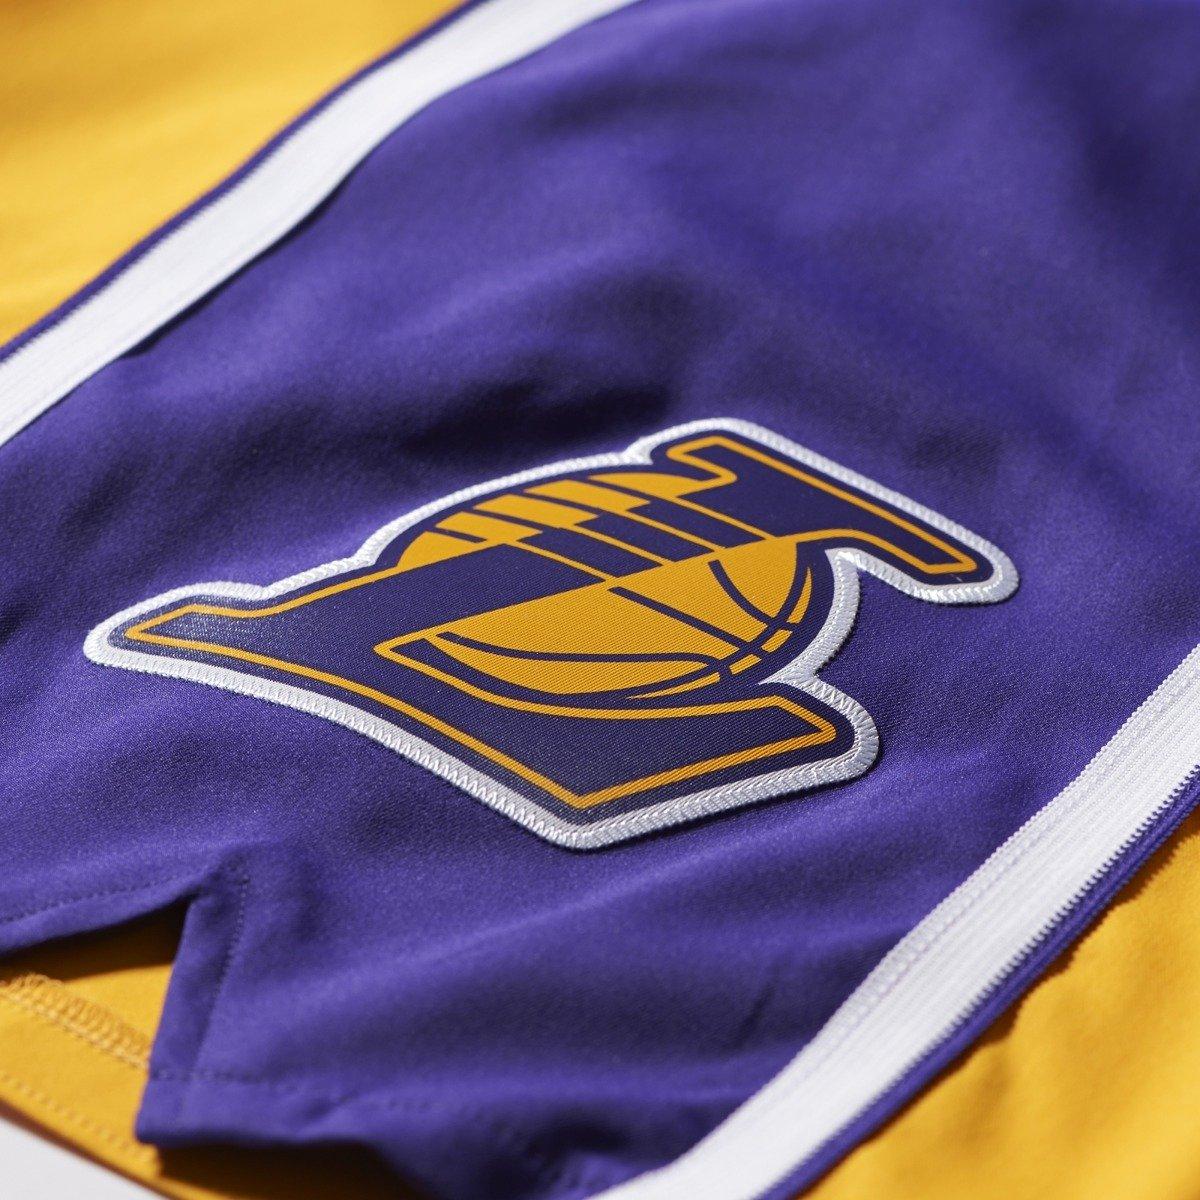 Nba Basketball Los Angeles Lakers: Adidas NBA Los Angeles Lakers Swingman Basketball Shorts